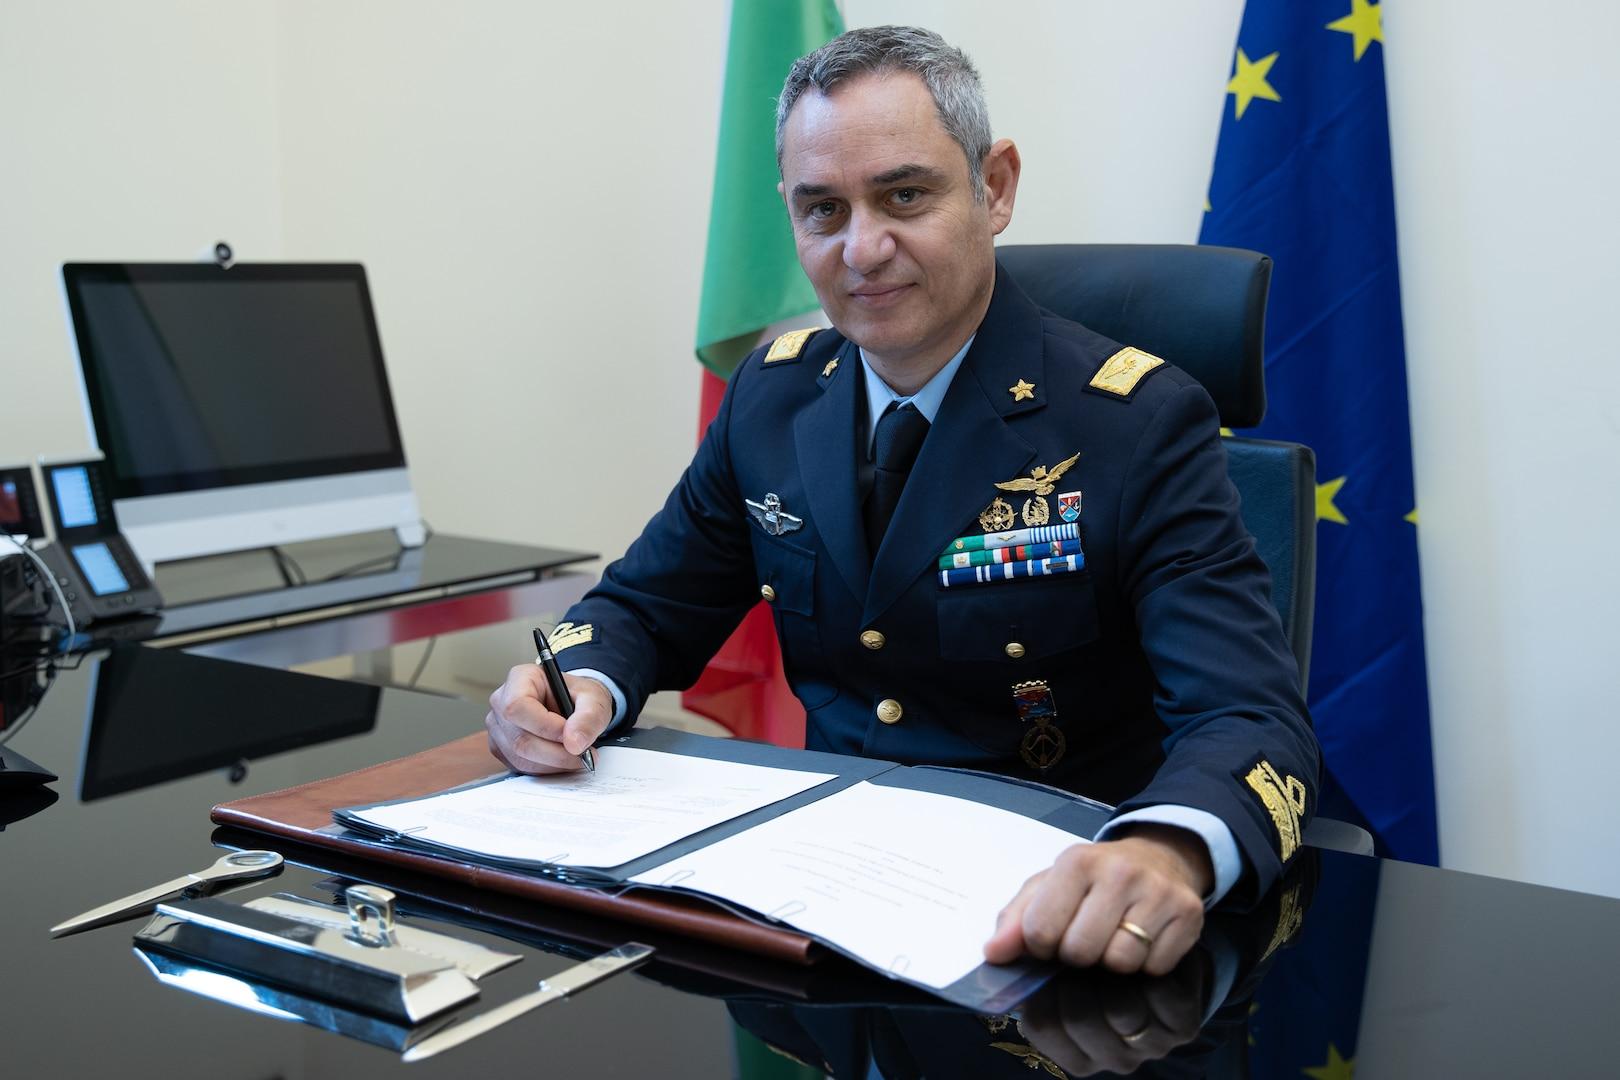 Italian Air Force general signs a memo.